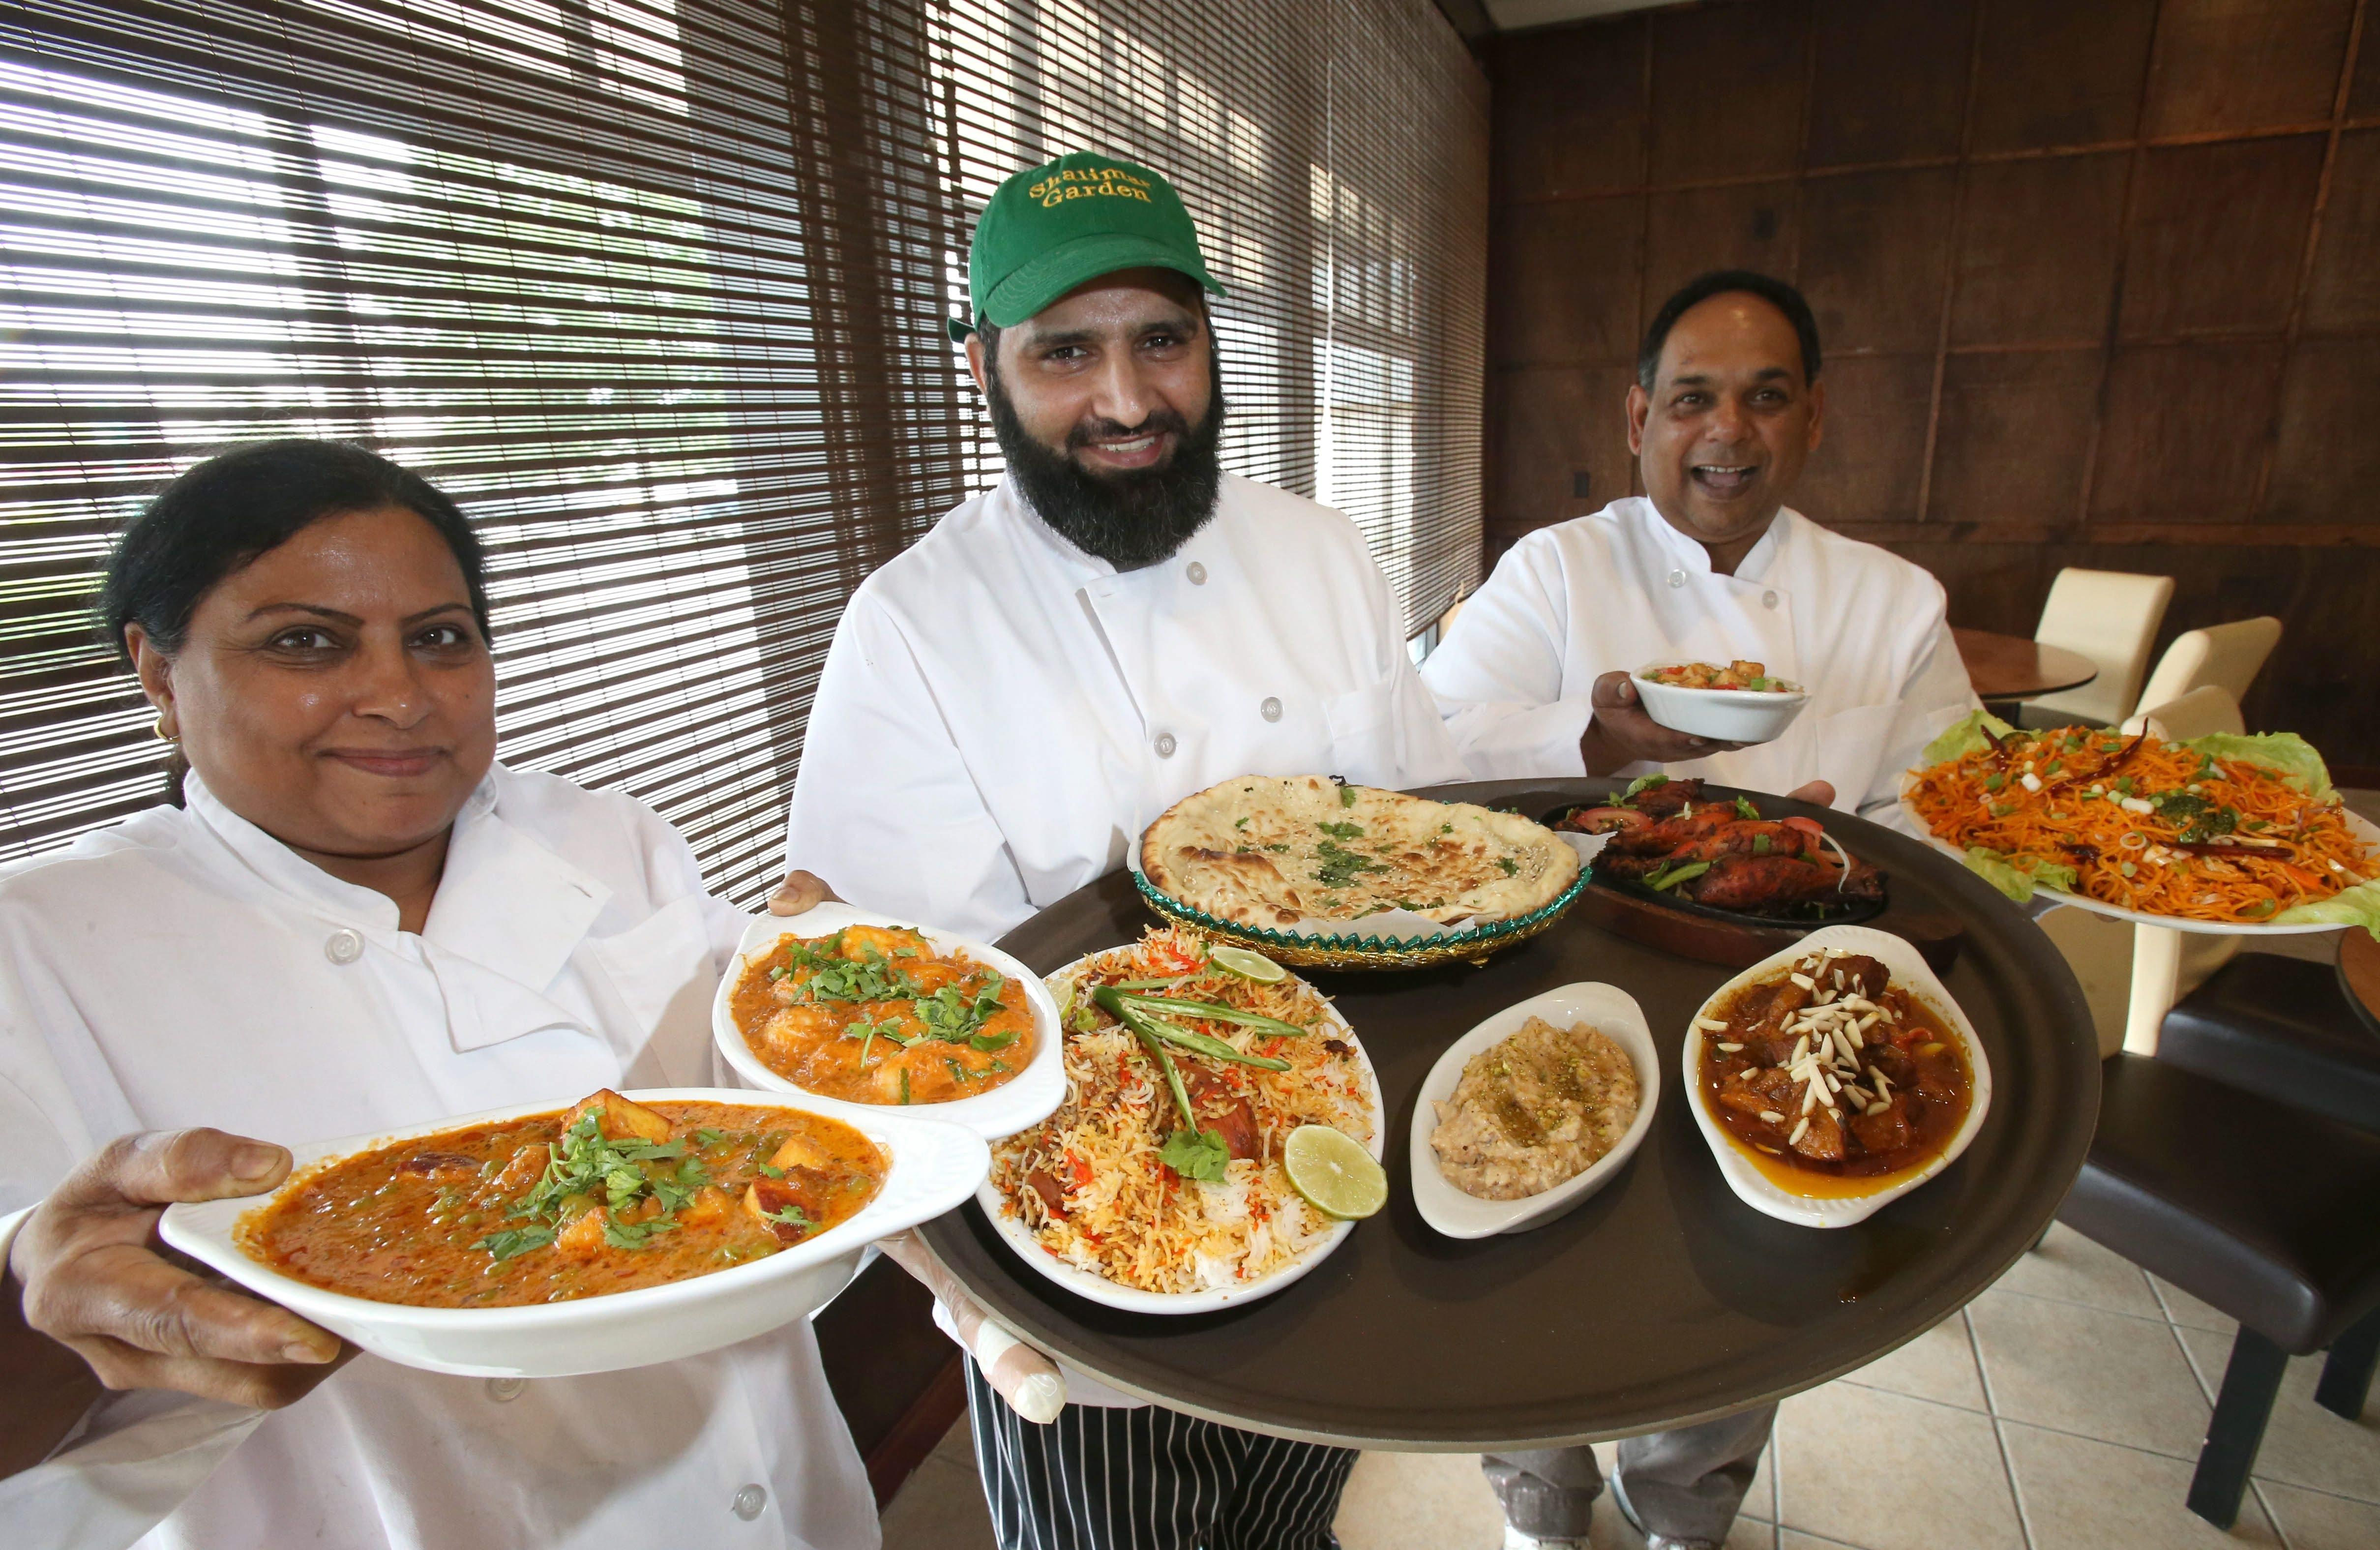 Robert Kirkham/Buffalo News  Specialty chefs display Hakka Chinese and Kashmiri dishes from Shalimar Garden. From left are chefs Poonam Matta, Abdul Shakoor and Robin Gabrail.